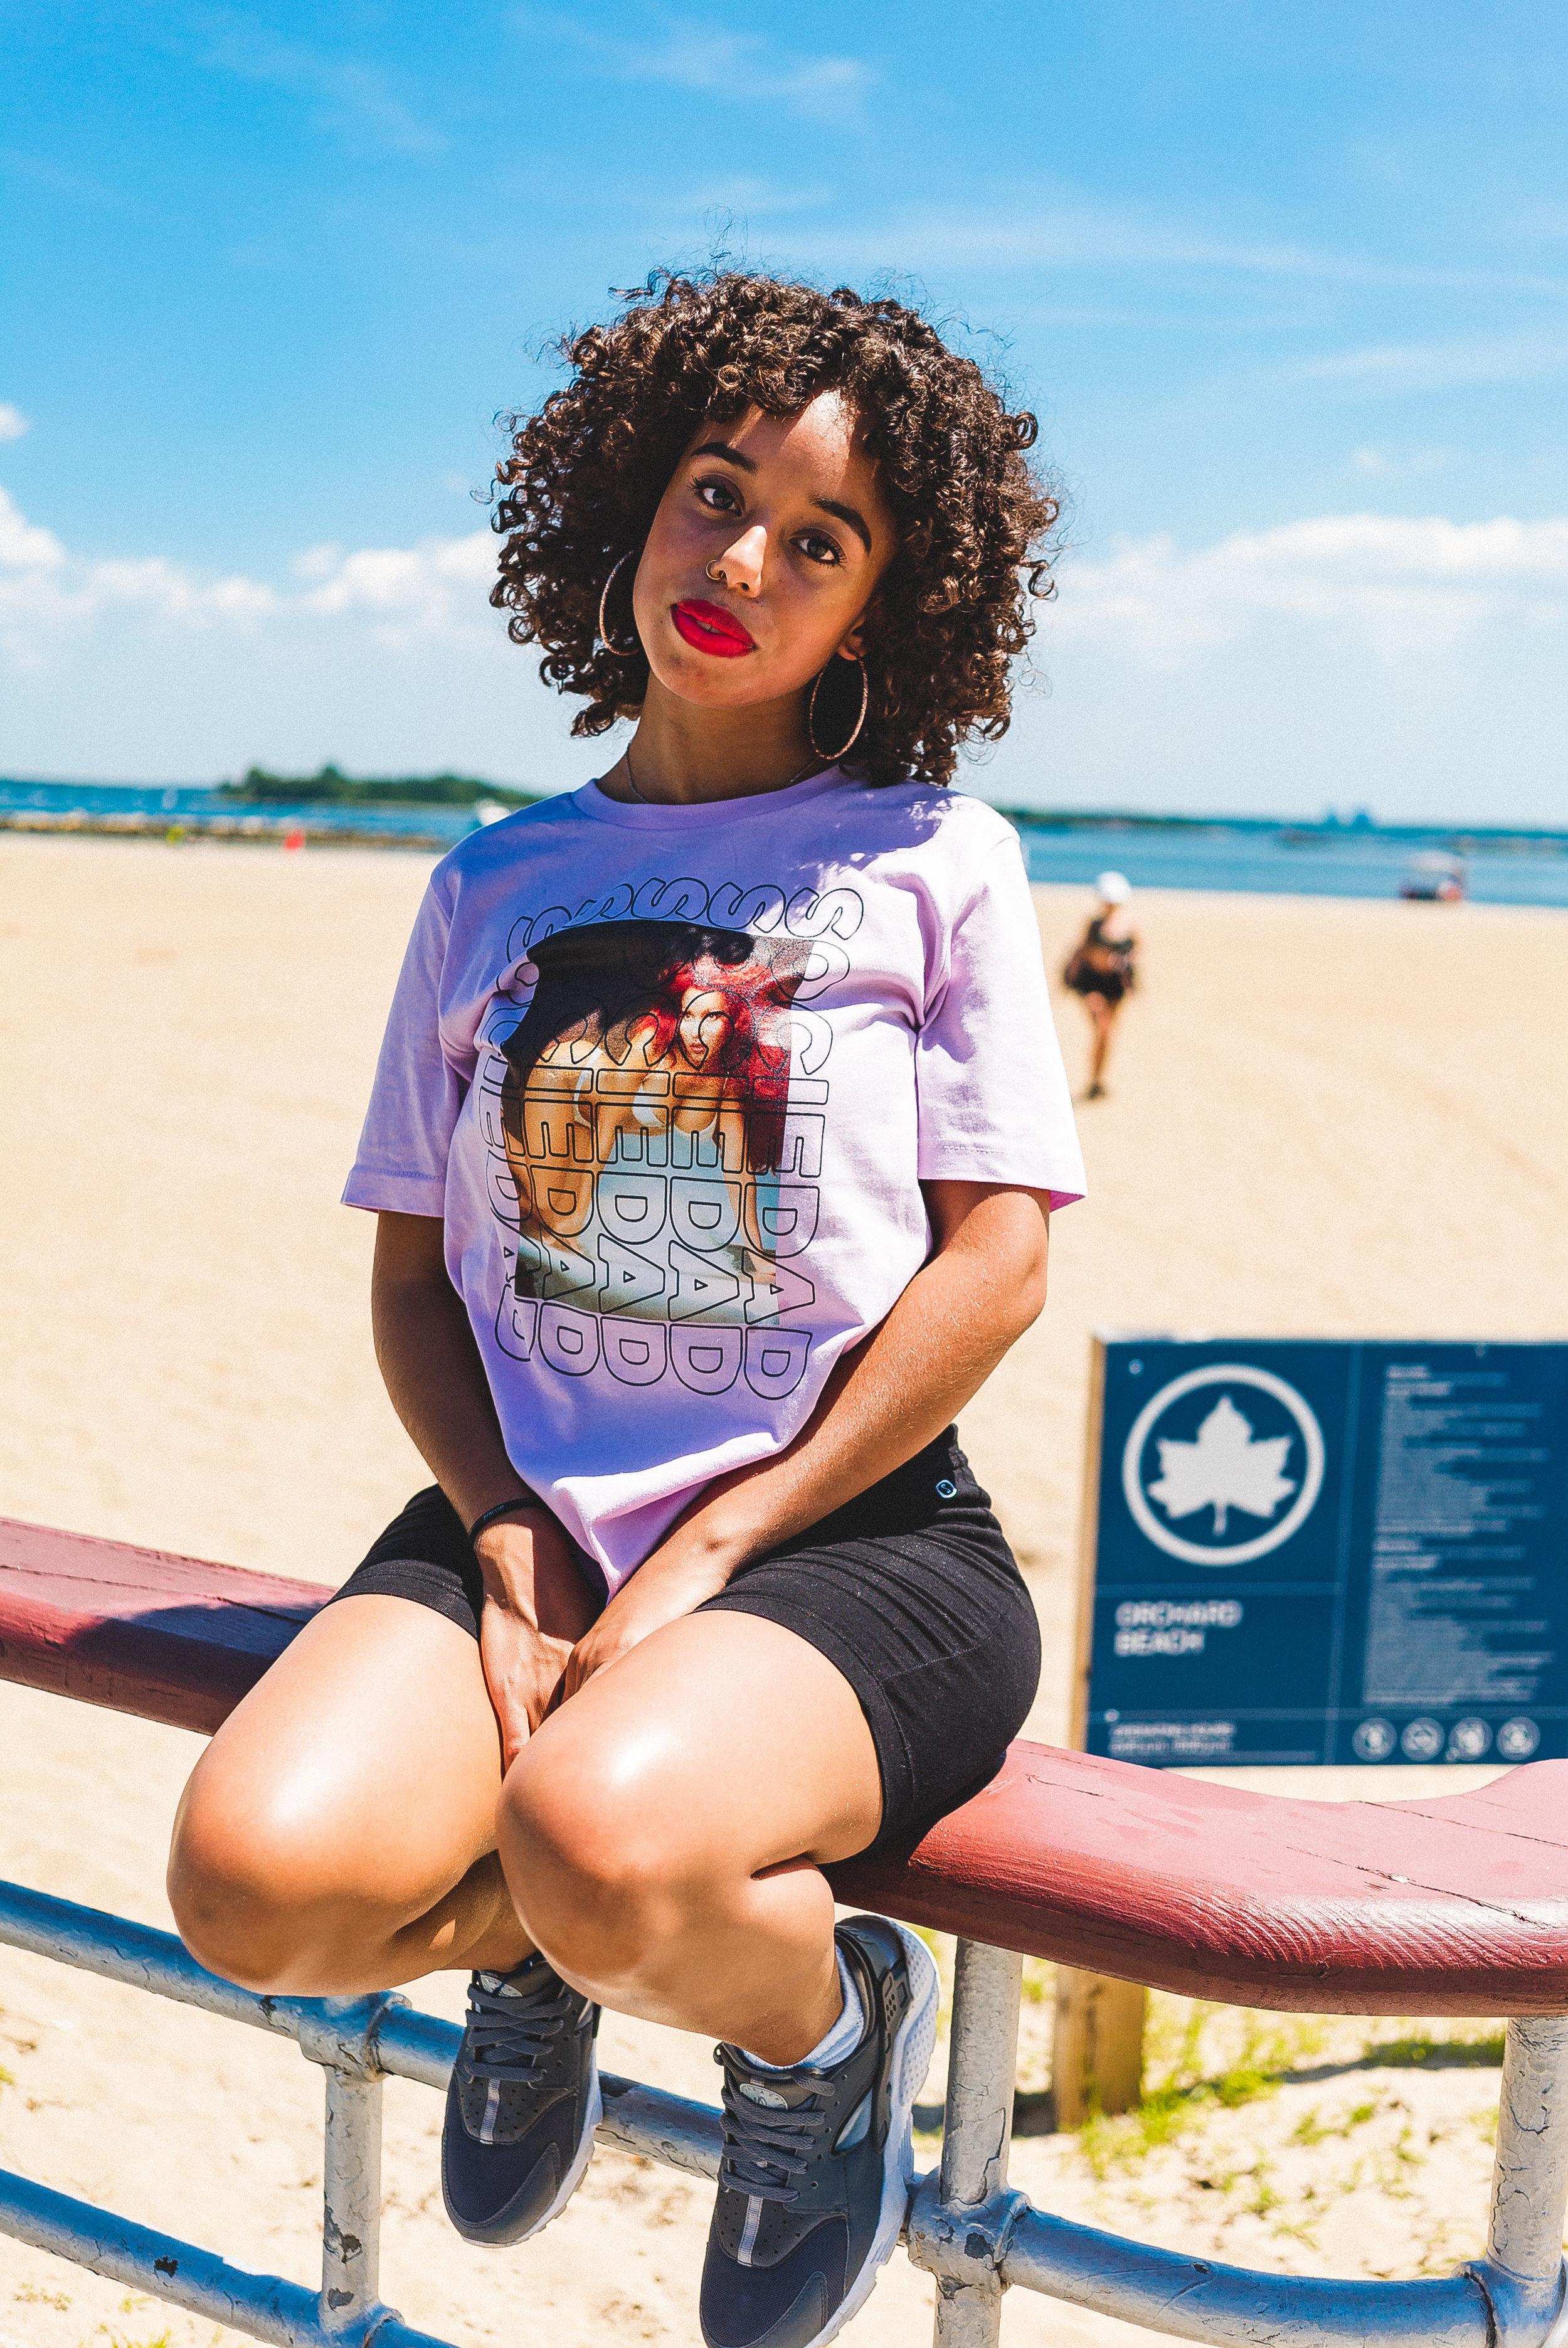 DJ 117-2019 Sociedad.Life Iris T-Shirt Nez_0019.jpg